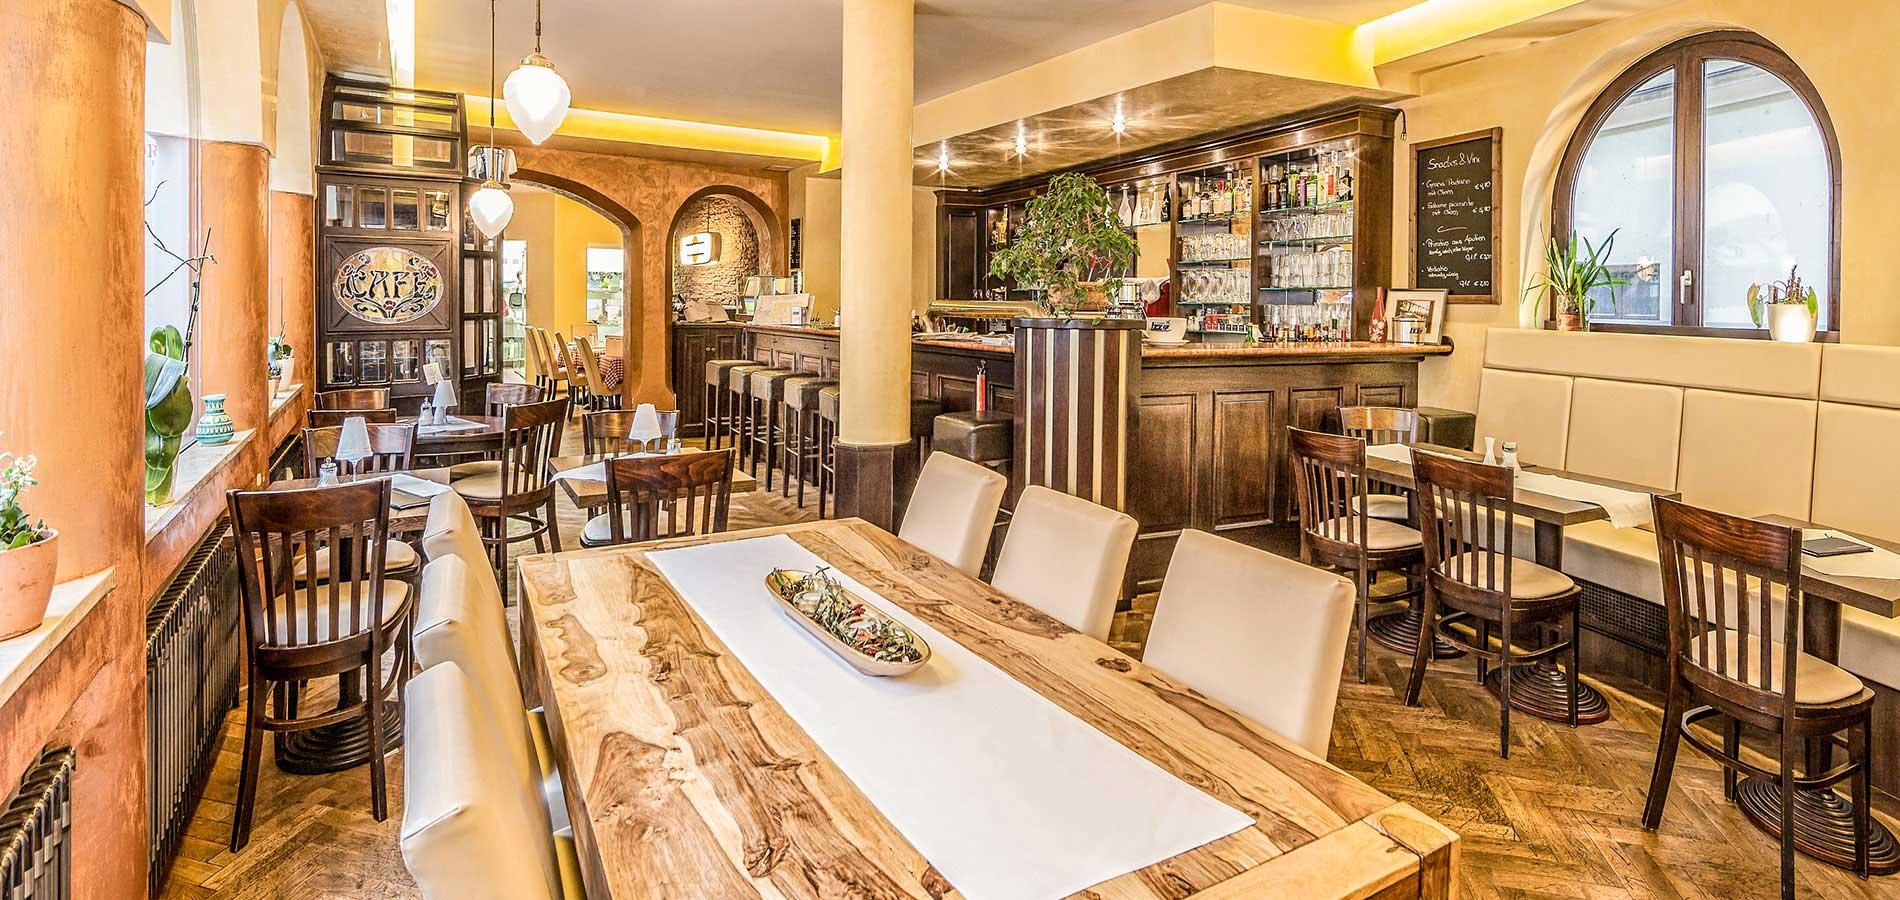 Caffé Torretta in Landshut